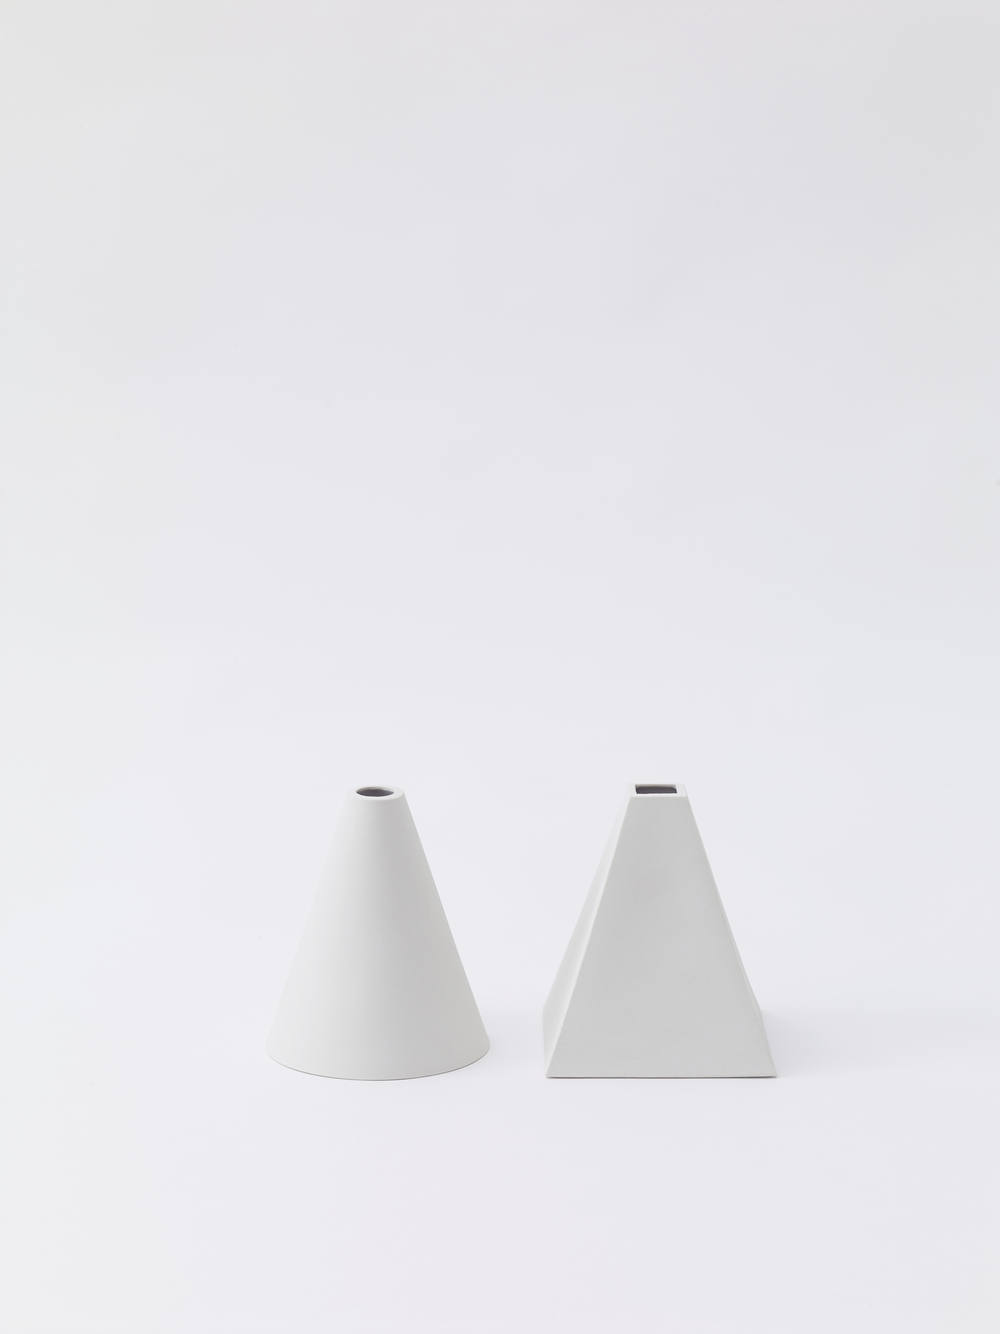 Cone + Pyramid   unglazed